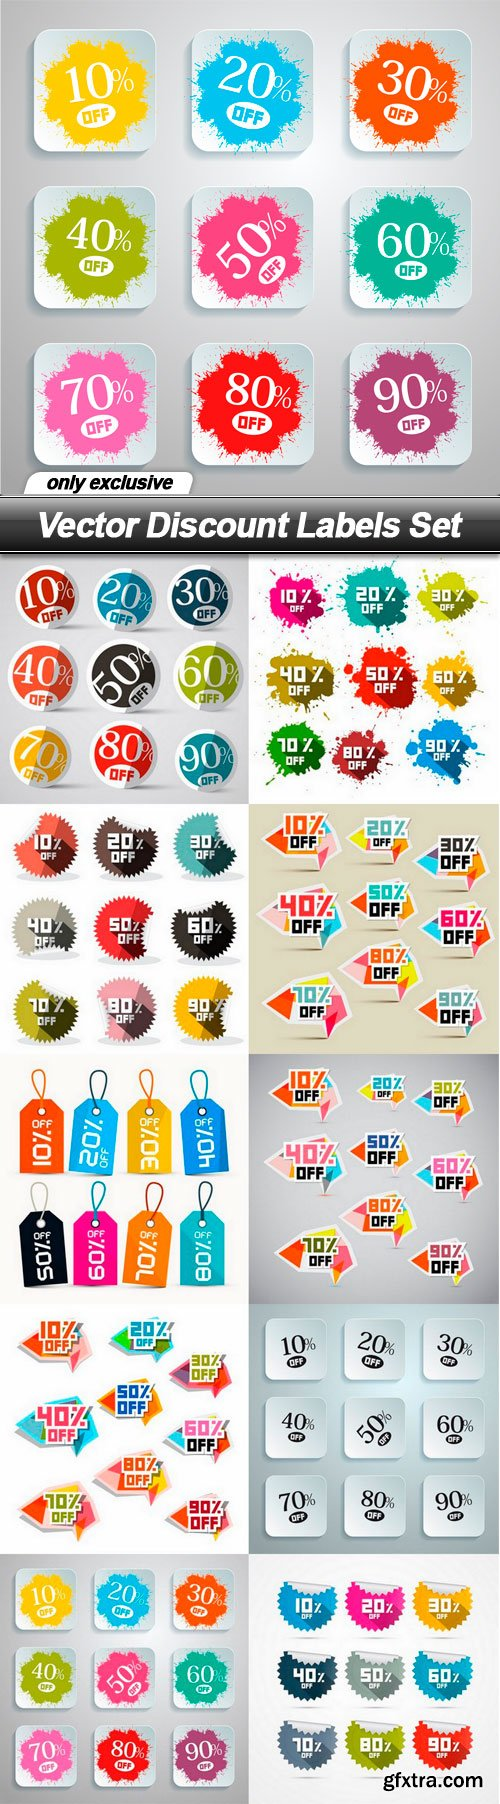 Vector Discount Labels Set - 10 EPS